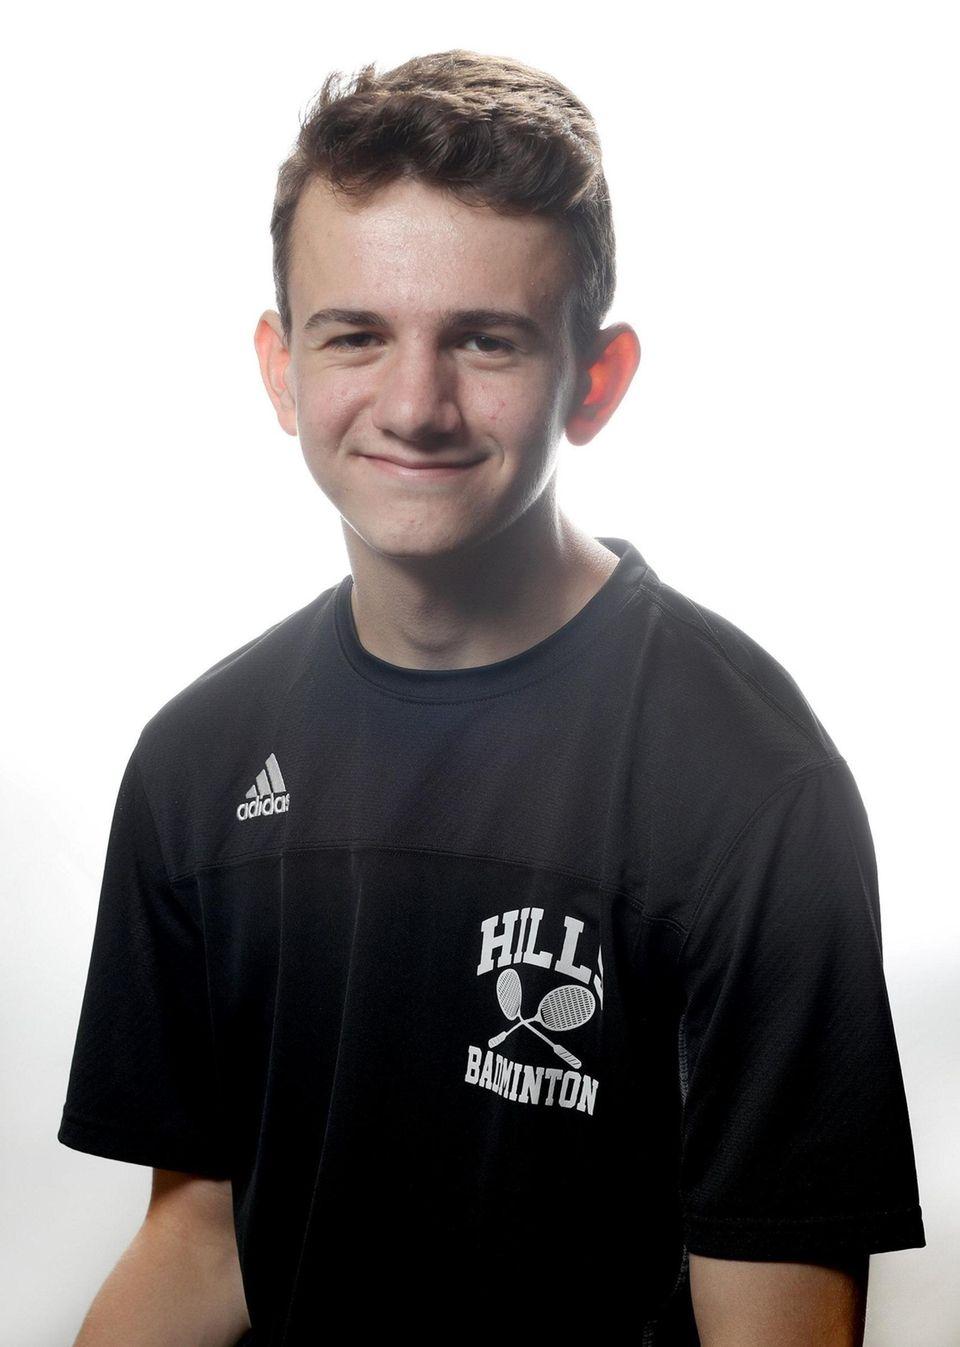 Boys Badminton - Jacob Roedel, Half Hollow Hills